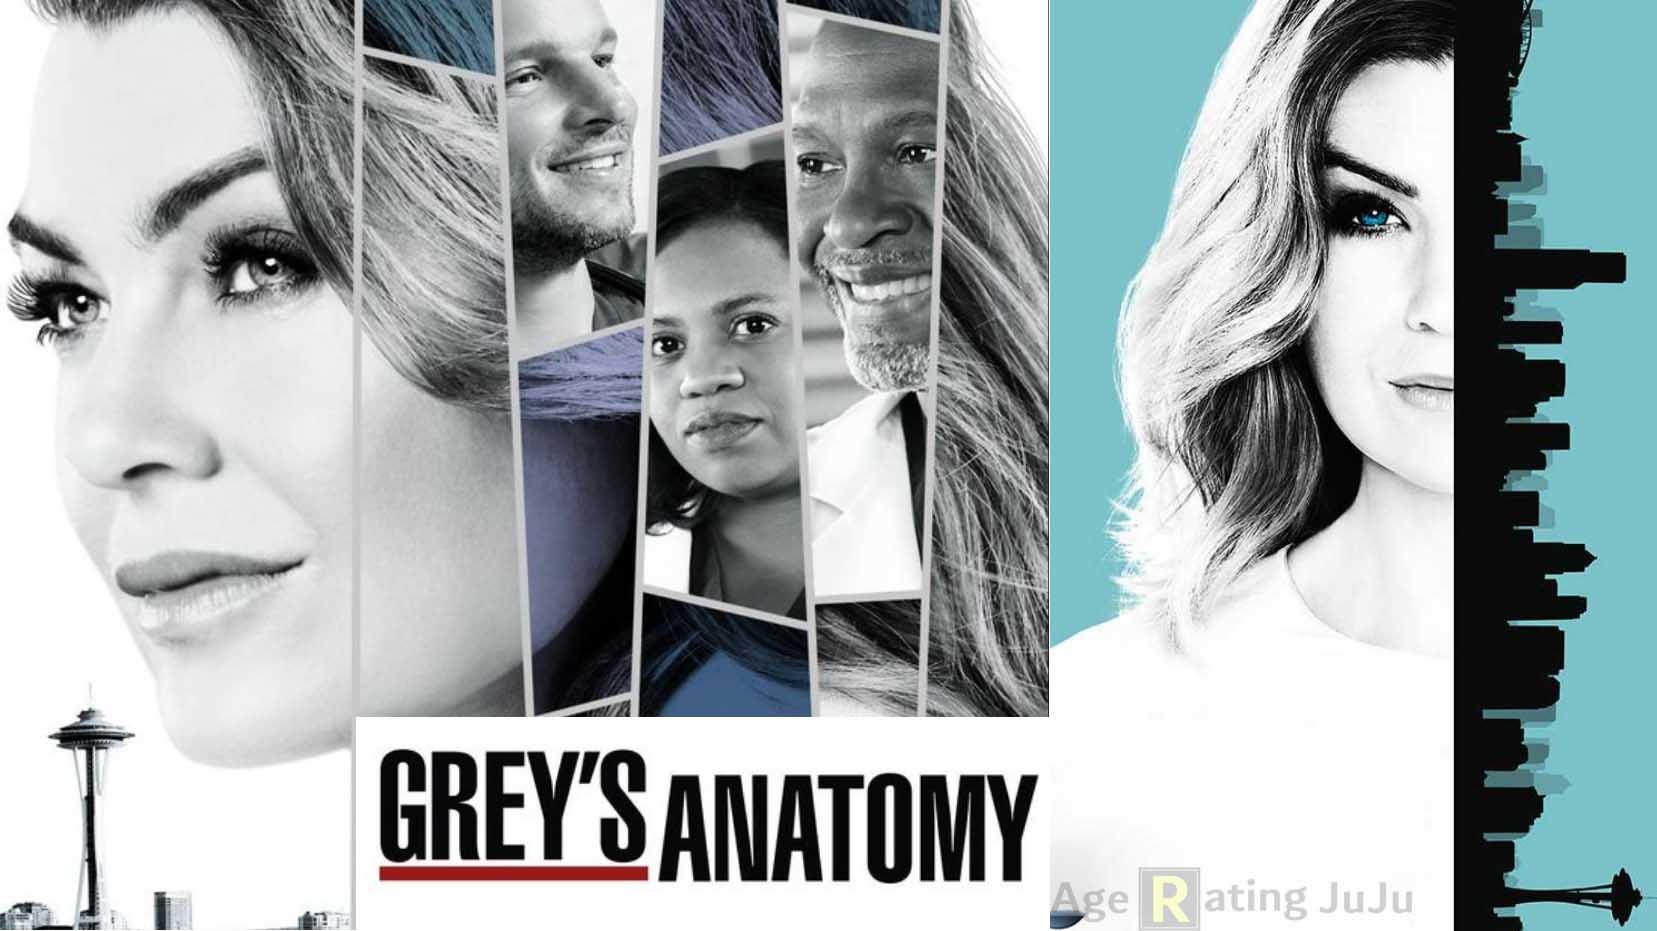 Grey\'s Anatomy Age Rating | Netflix TV Show 2018 Parental Guideline